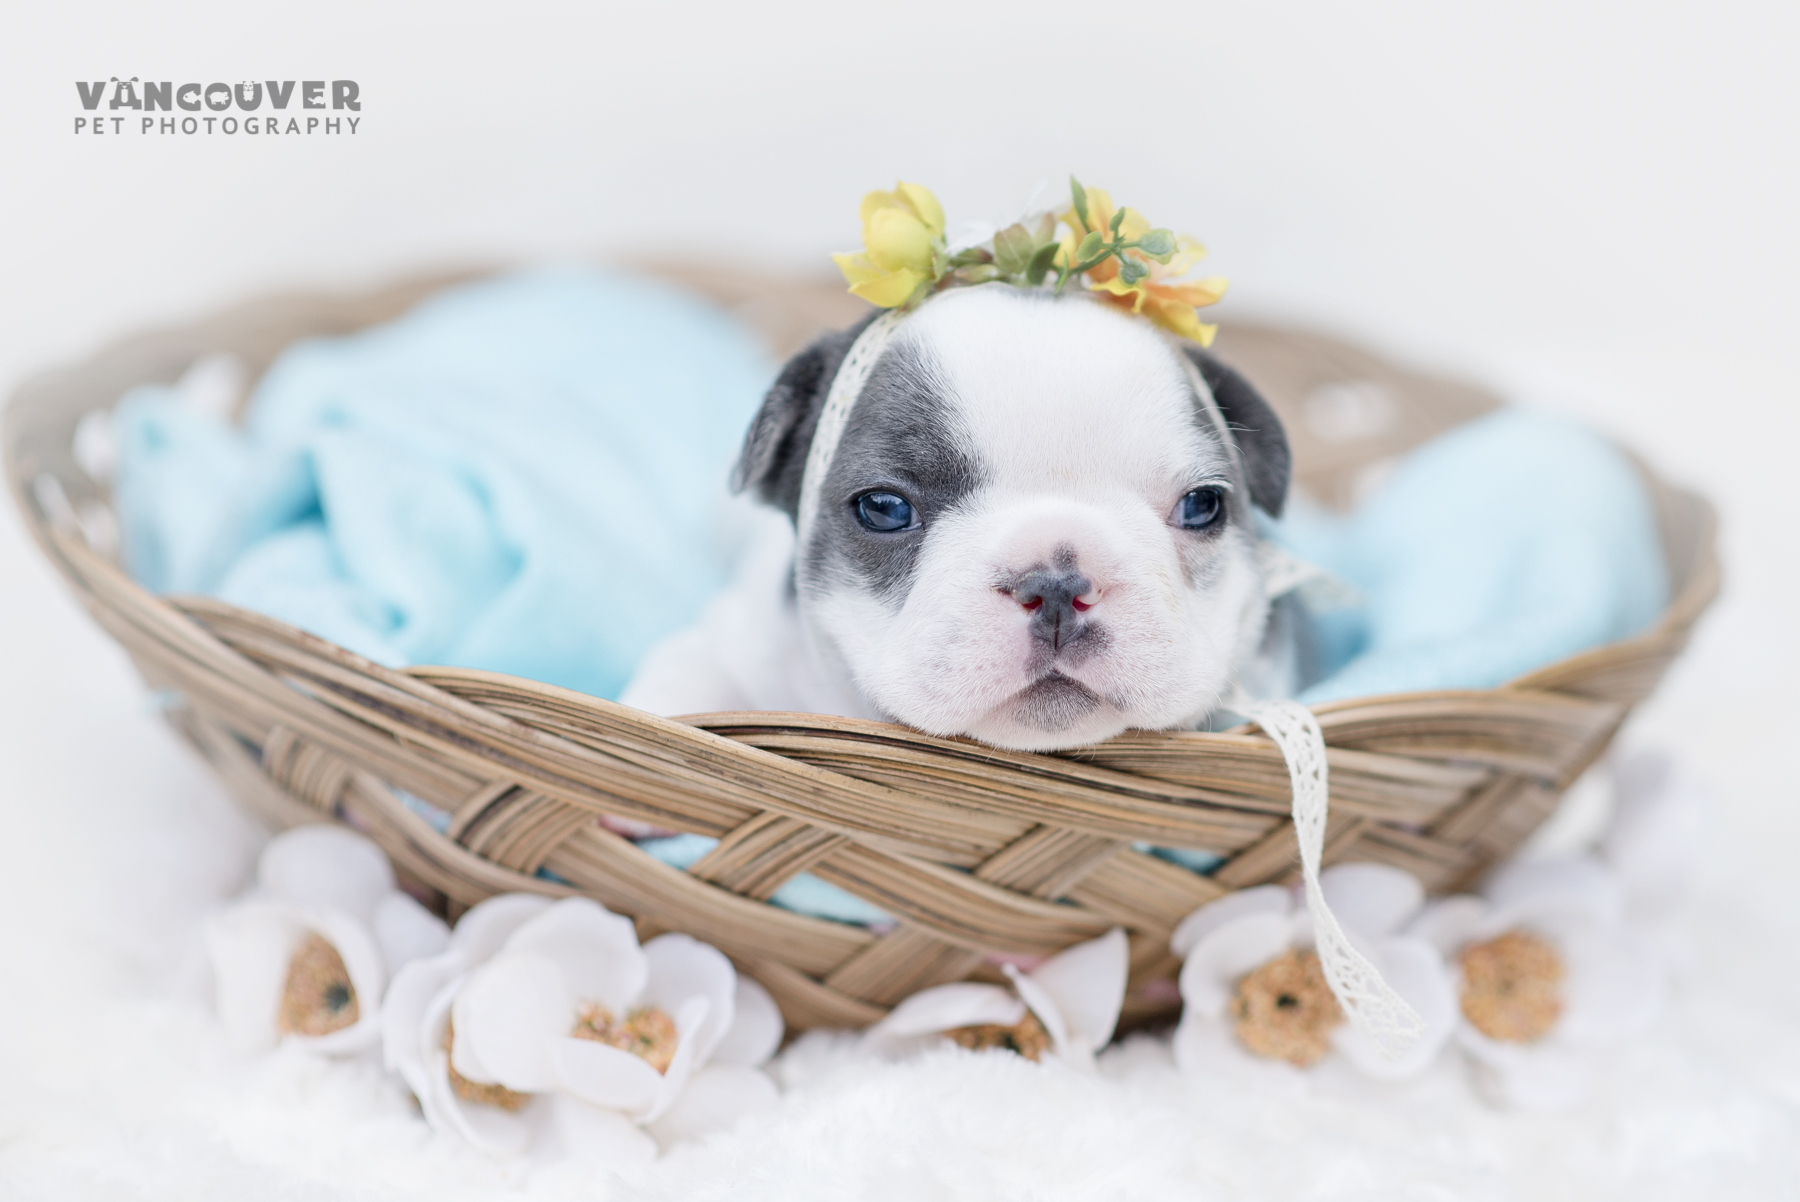 French_bulldog_puppy_photo_Vancouver-3.jpg